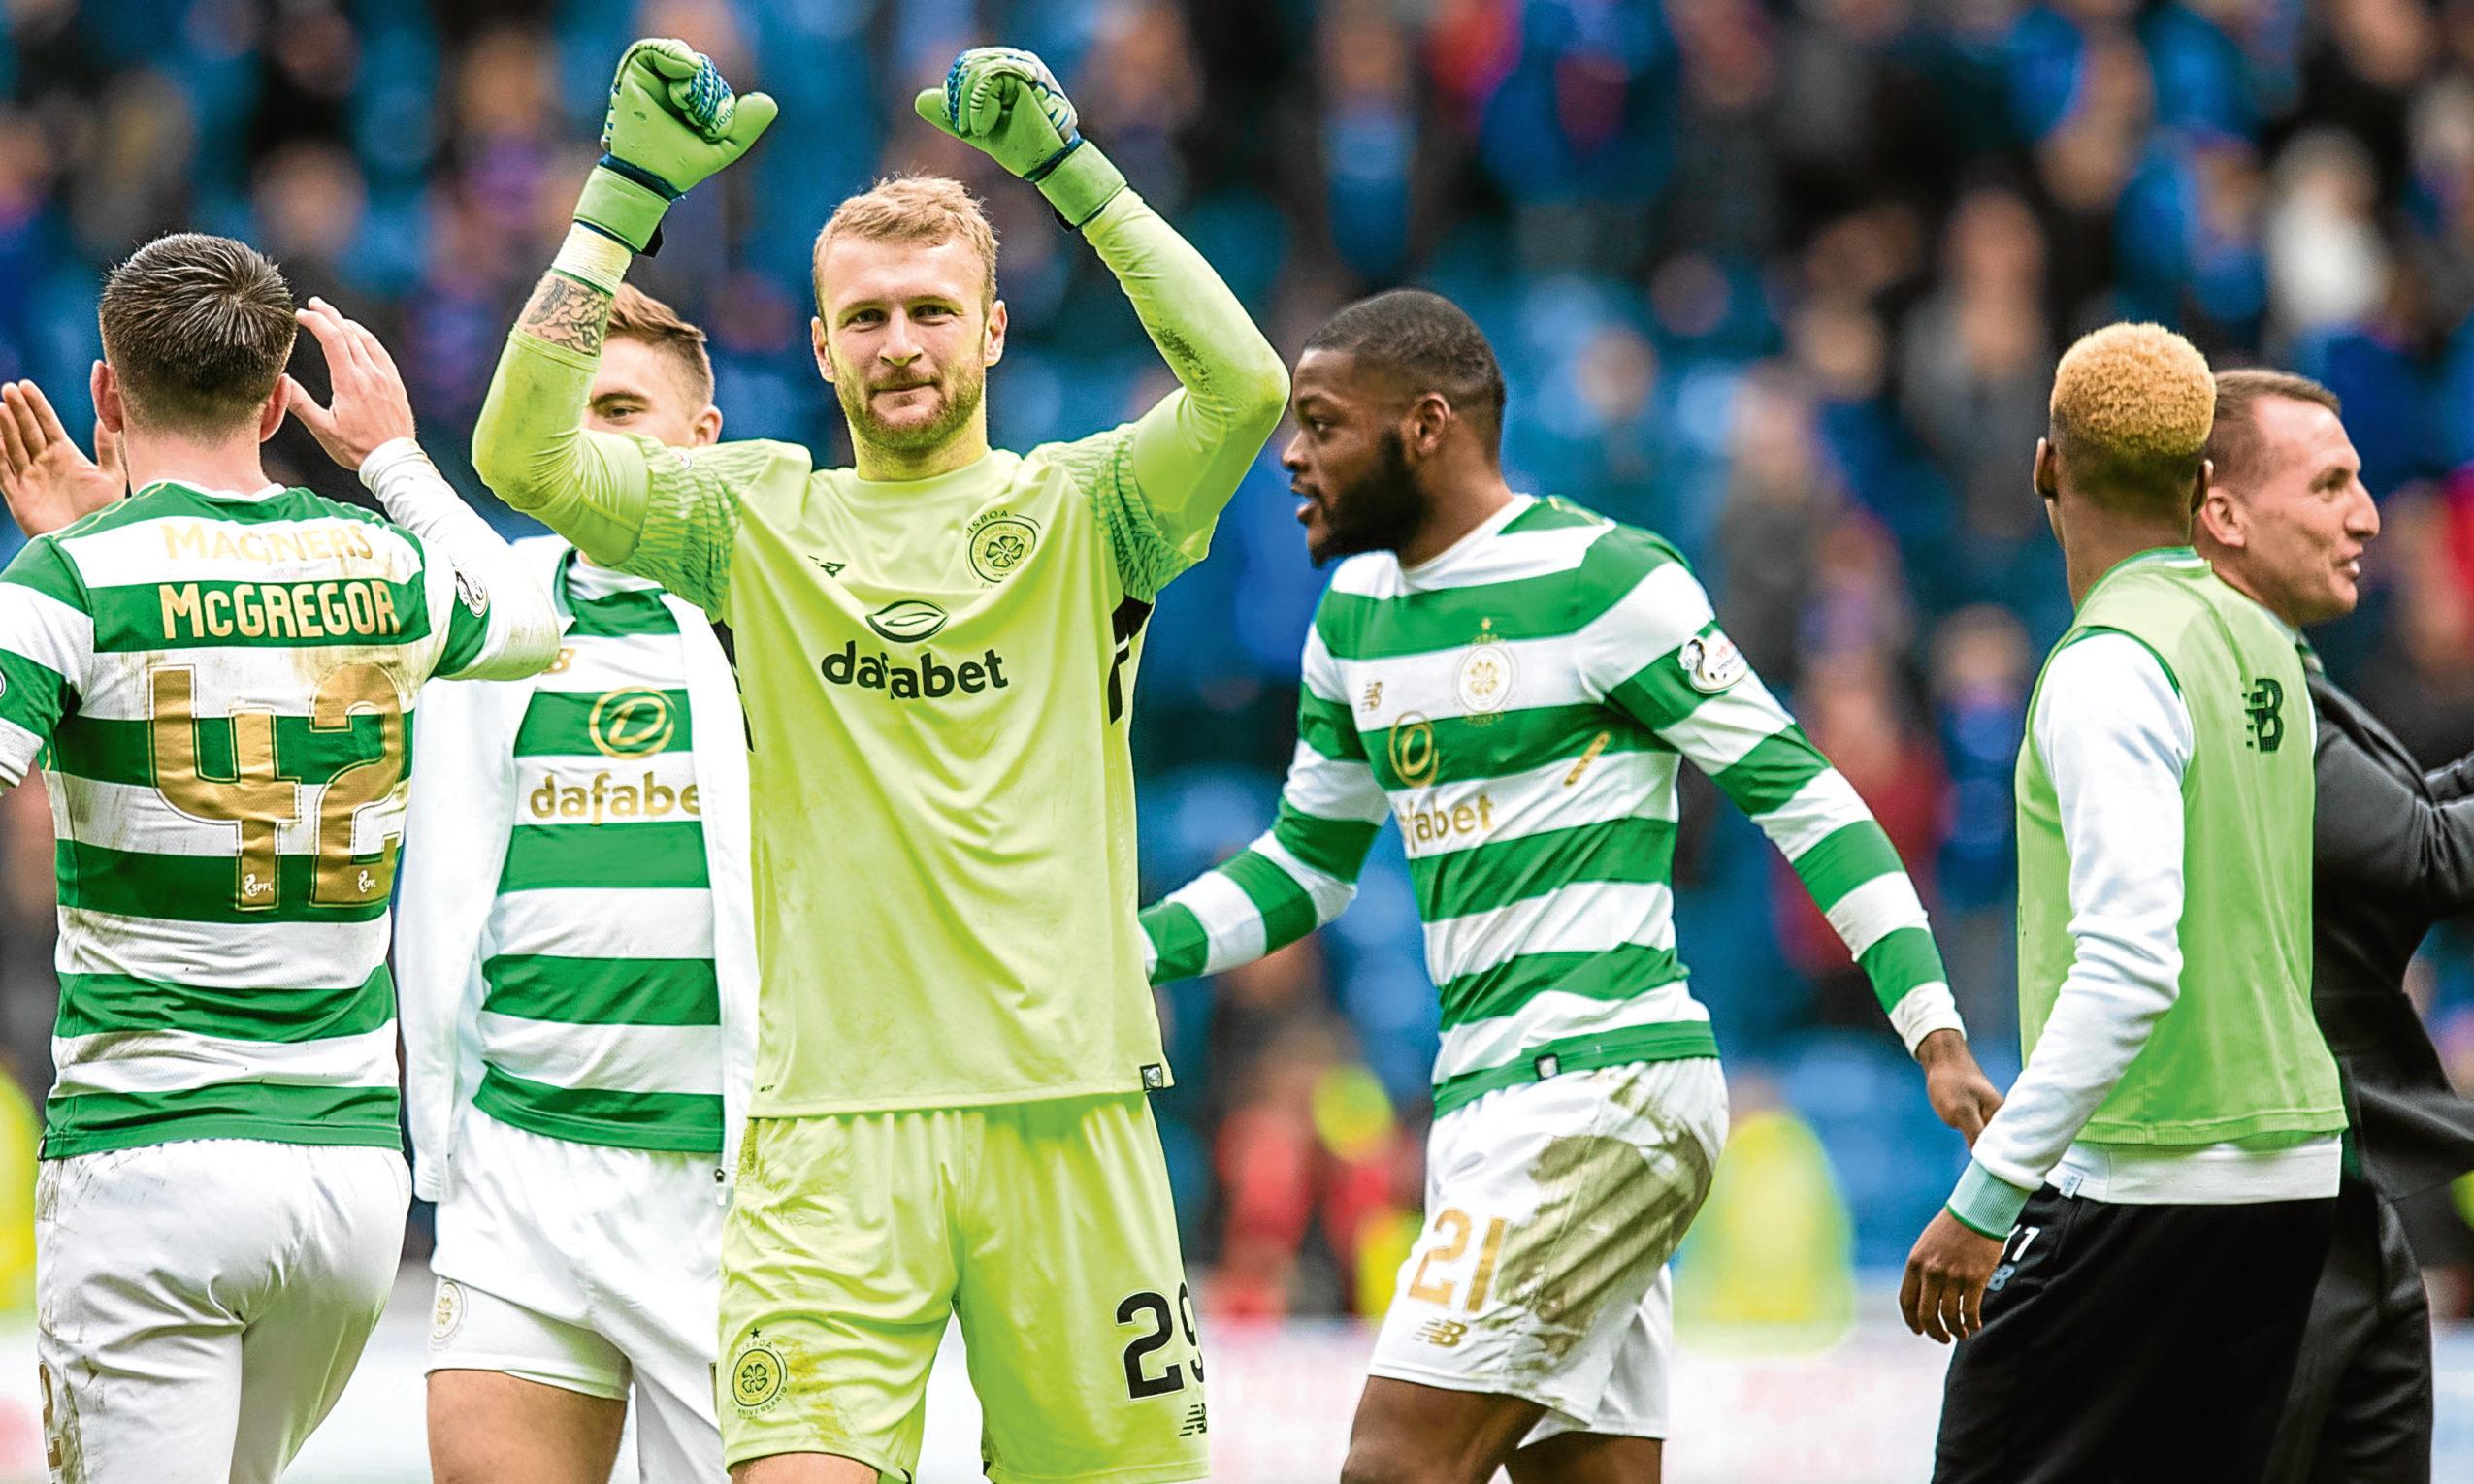 Celtic's Scott Bain celebrates at full time